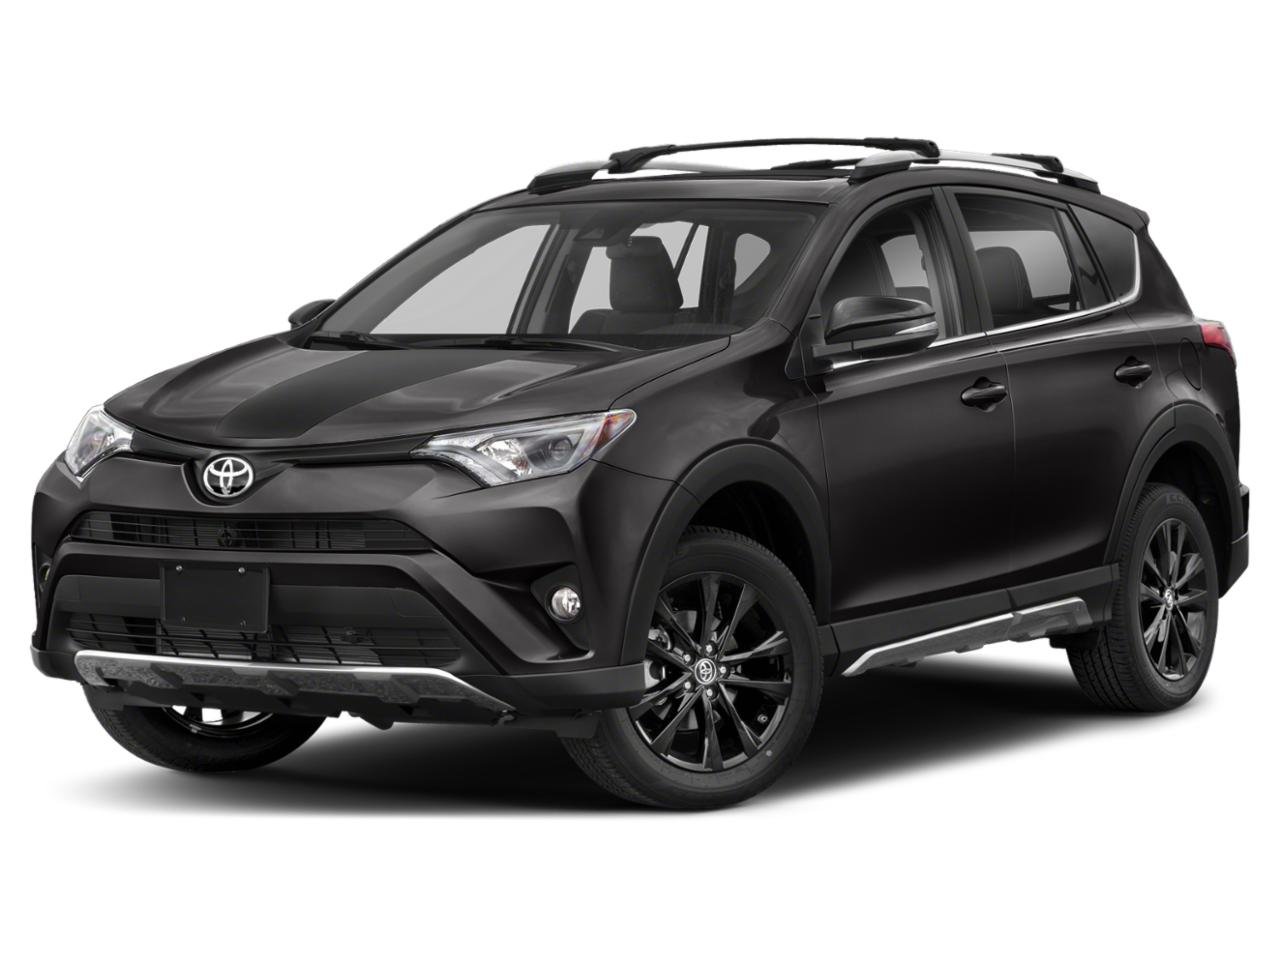 2018 Toyota RAV4 Vehicle Photo in Beaufort, SC 29906